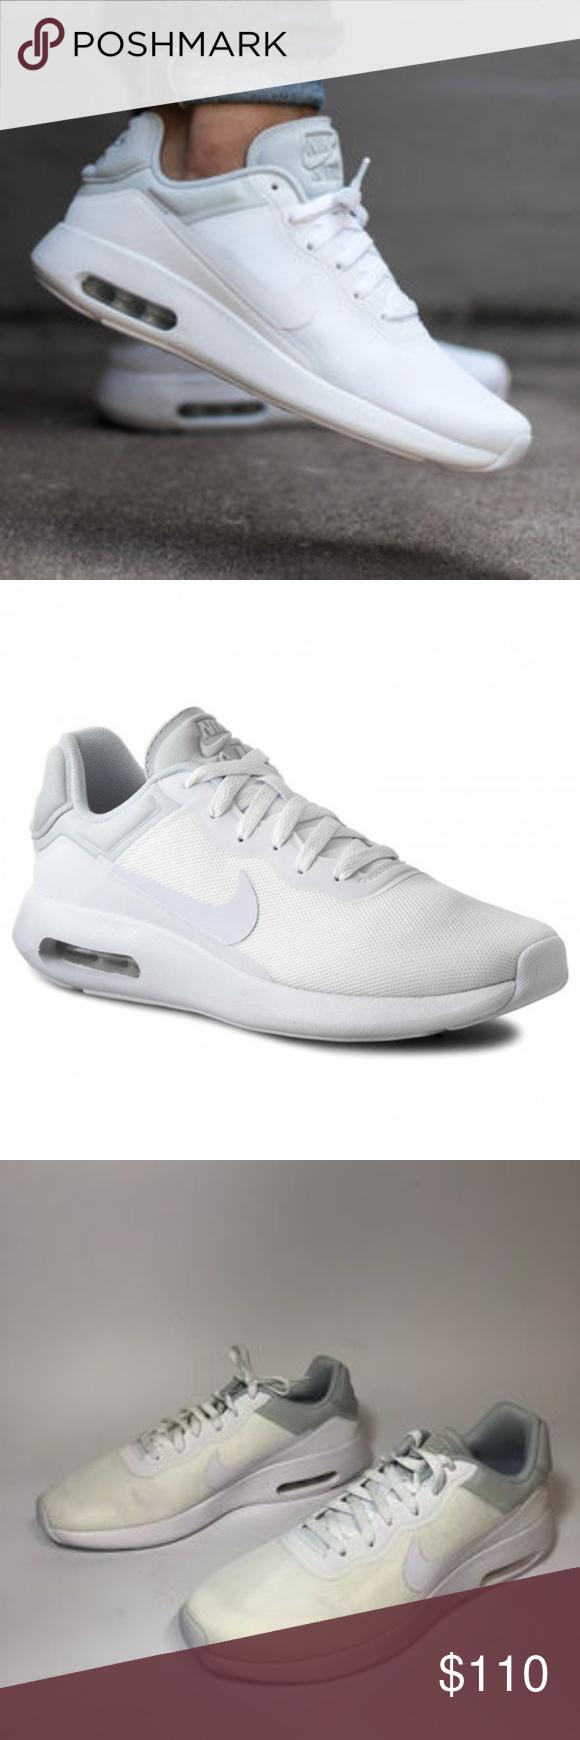 aa2cc36832d9 NEW Nike Air Max Modern Essential Men s Running